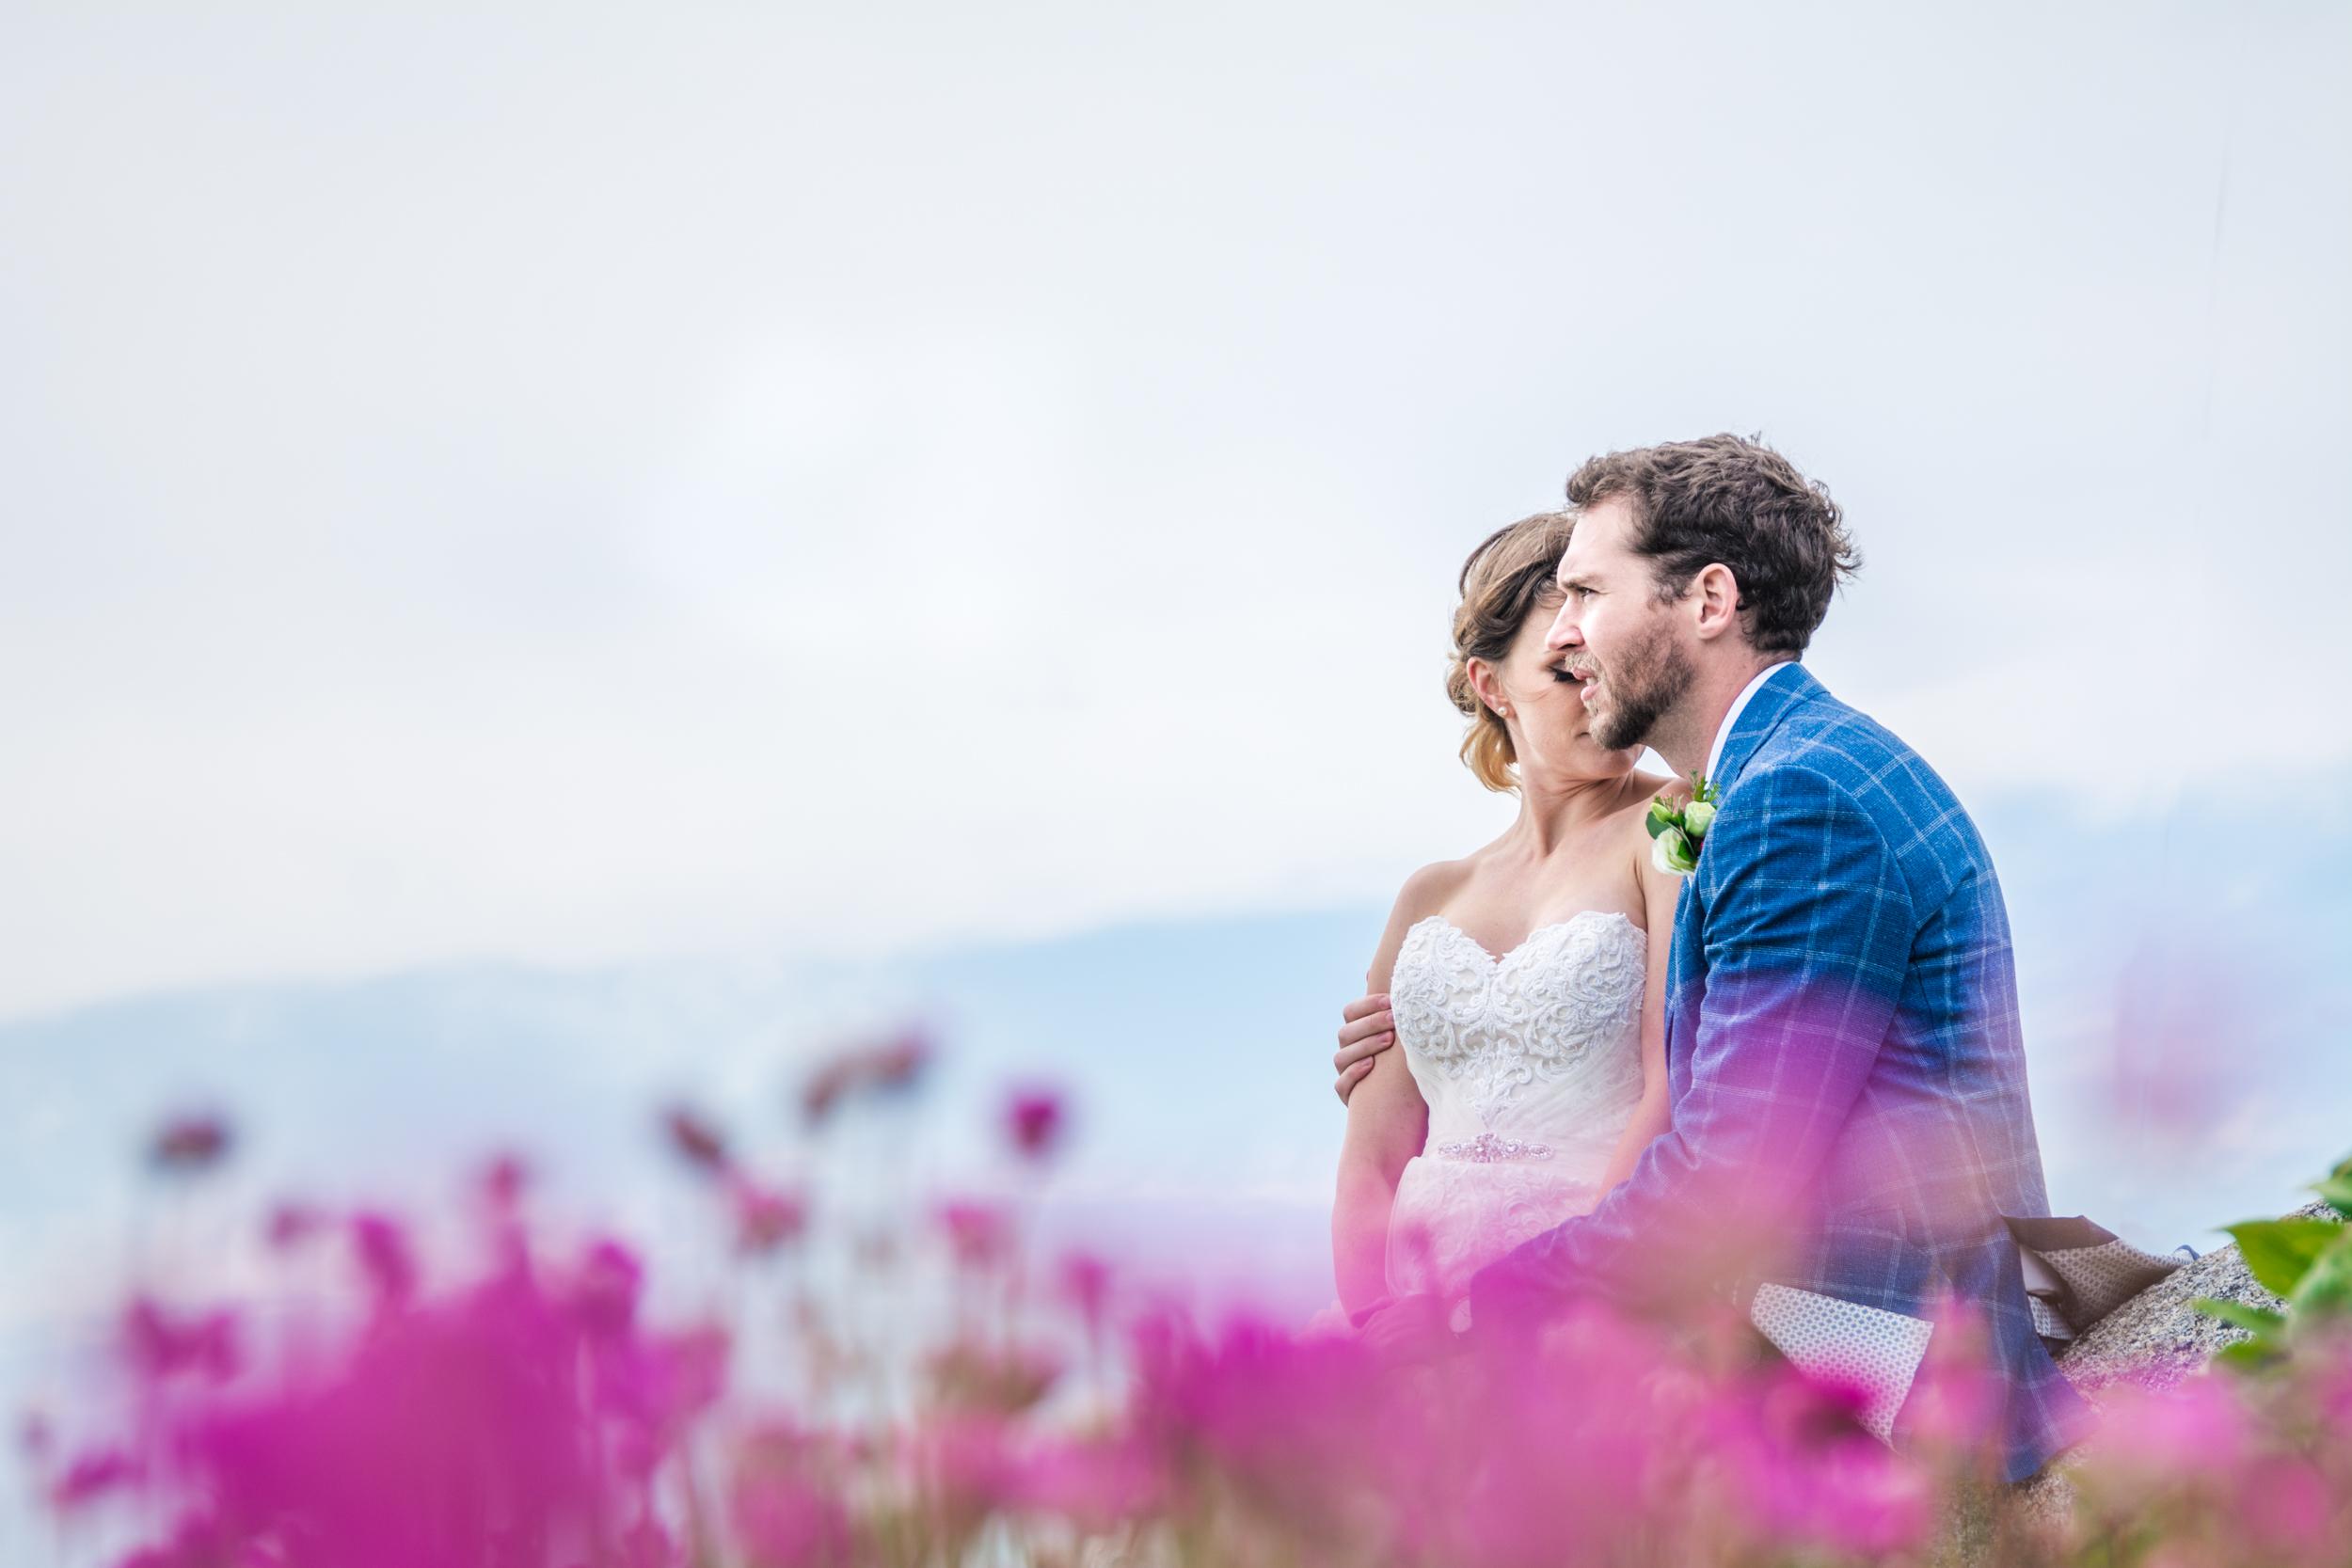 DonJess-ocean-wedding-halifax-16.jpg